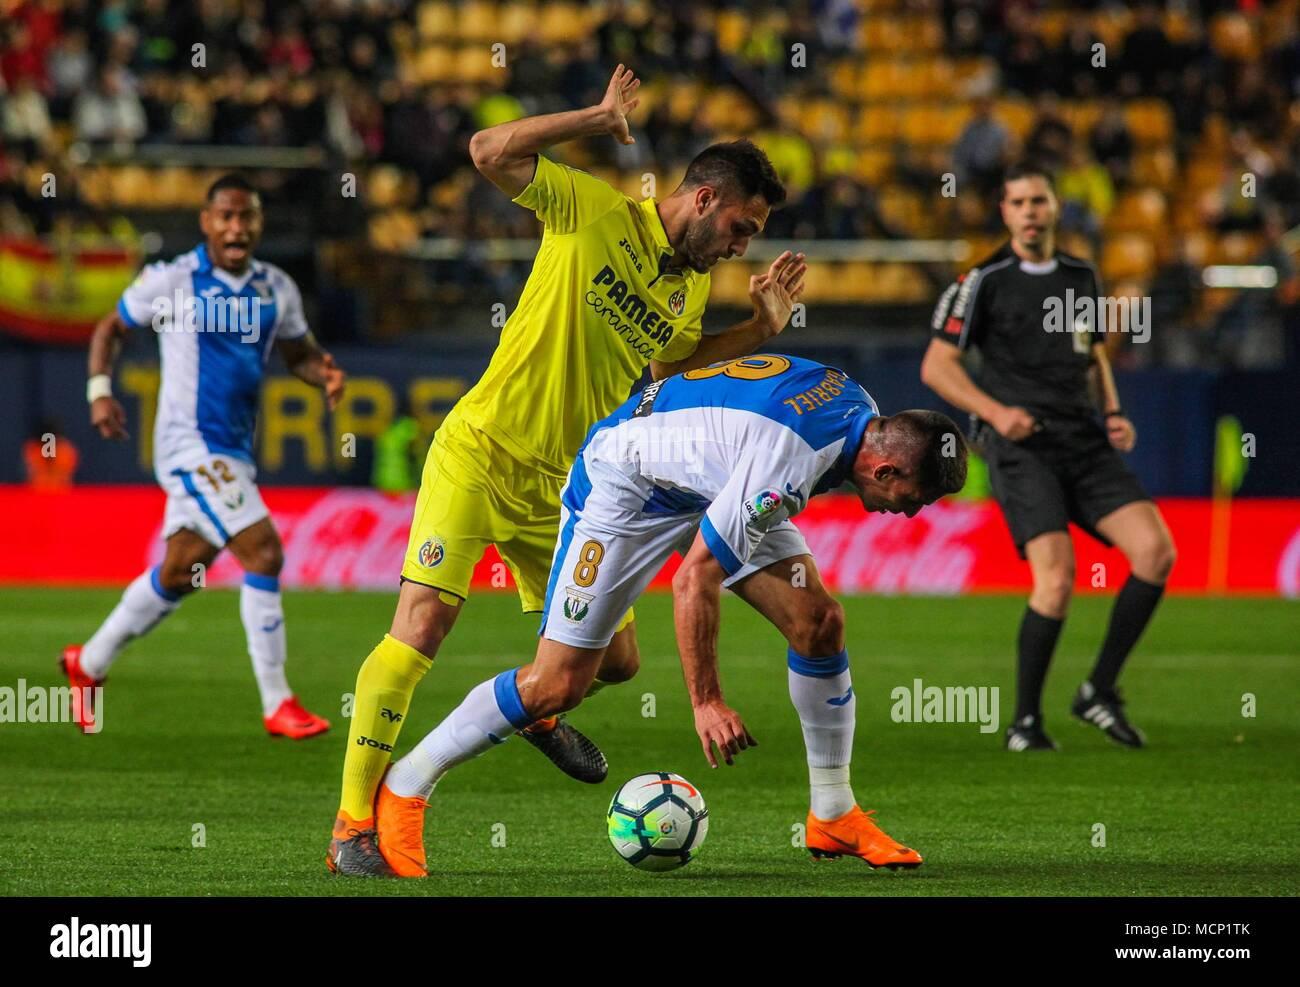 20739d7b428 Victor Ruiz and Gabriel during the match between Villarreal CF and CD  Leganes at the Estadio